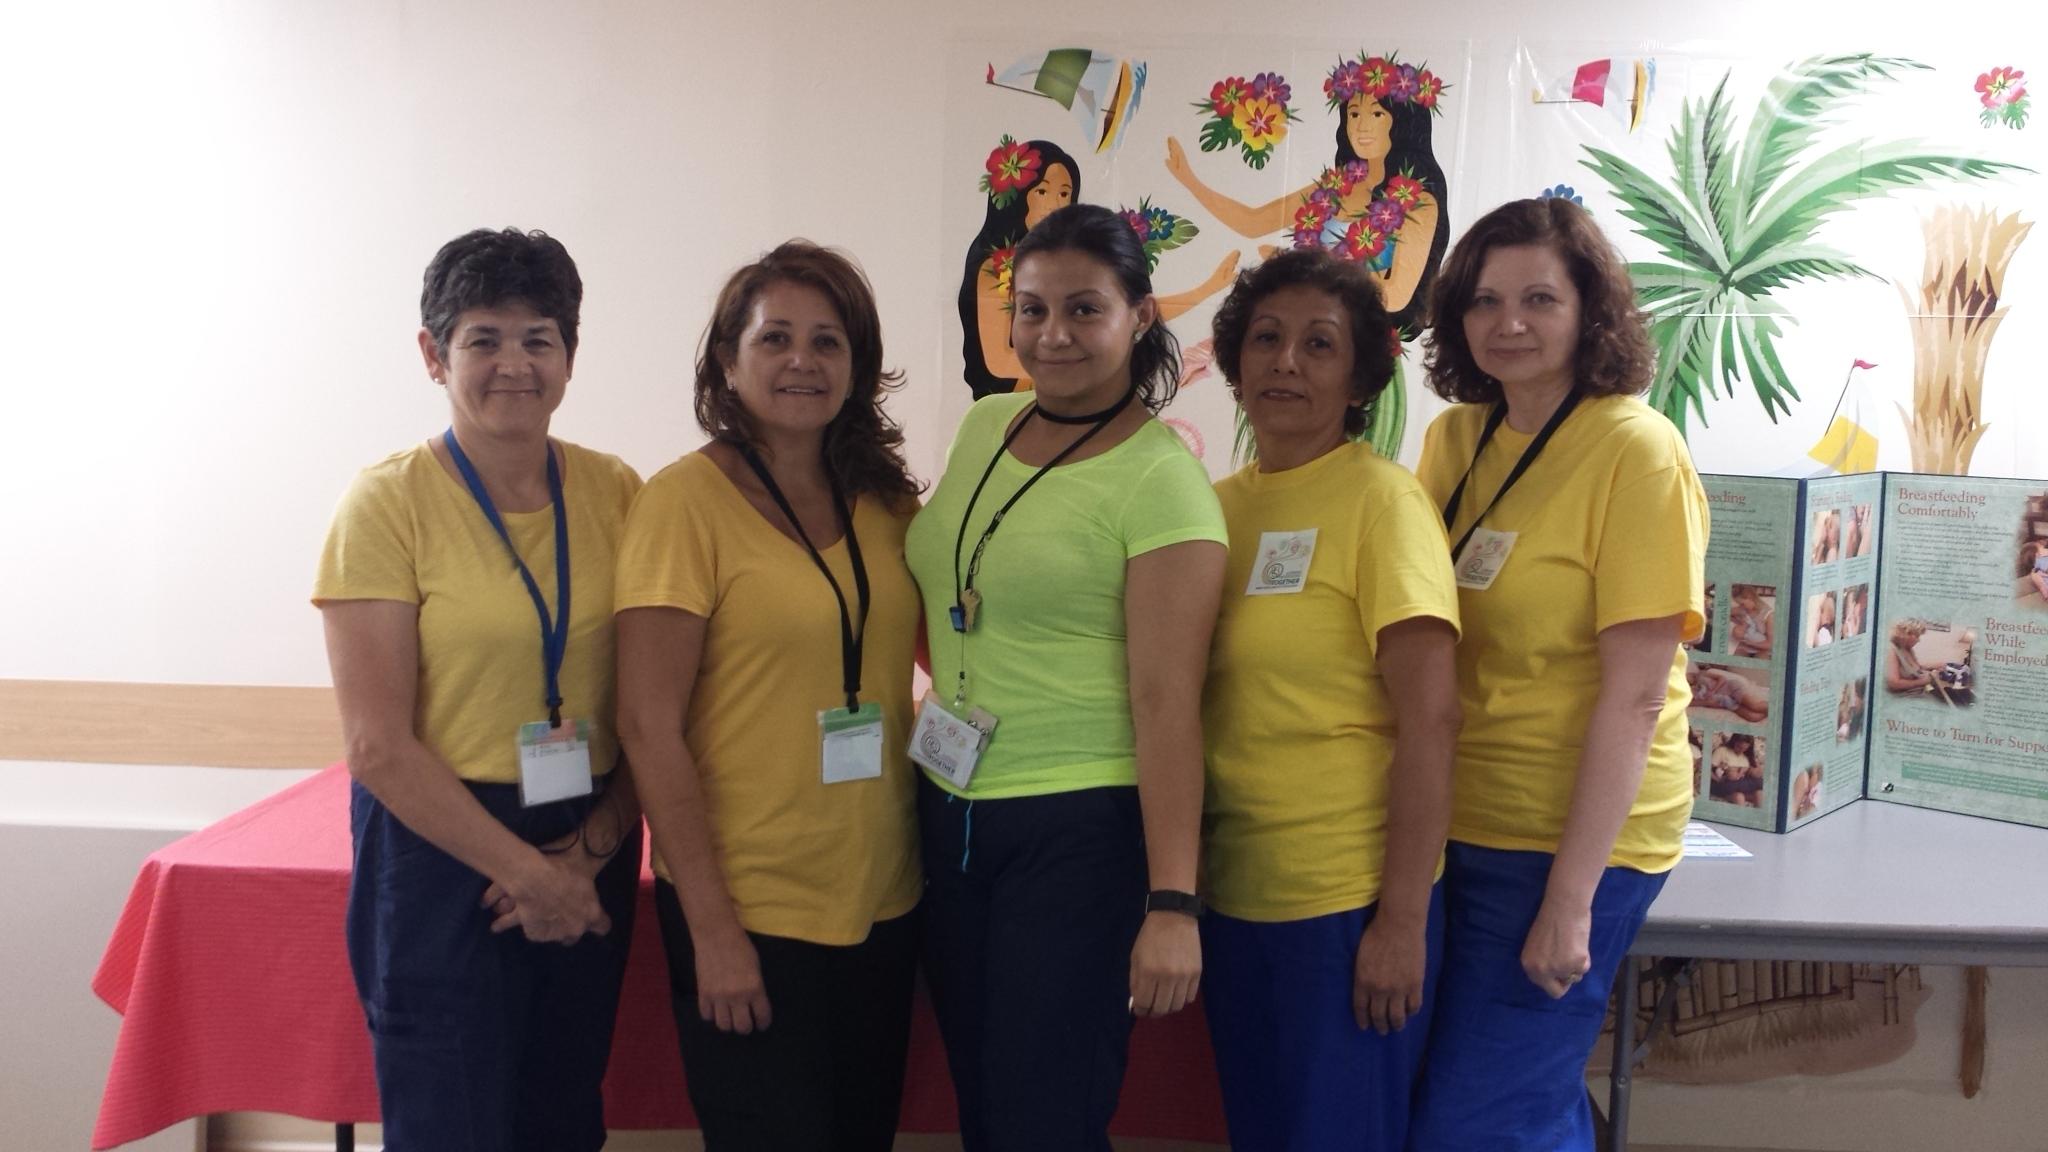 Staff During Breastfeeding Week